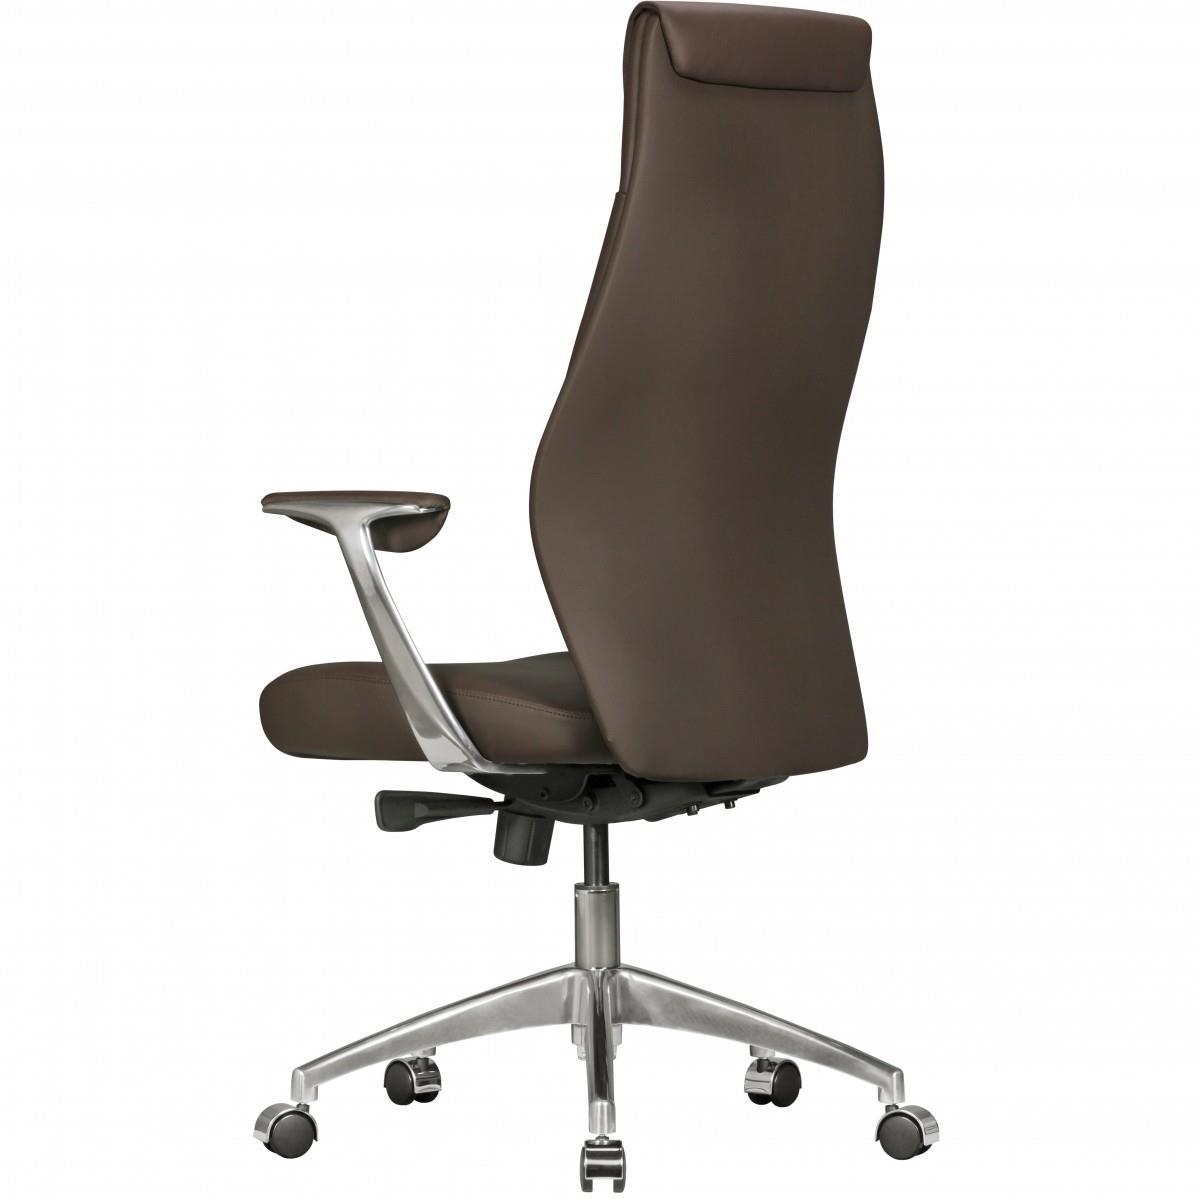 Sedia da ufficio SAVOIA, Design Elegante, Comoda ...